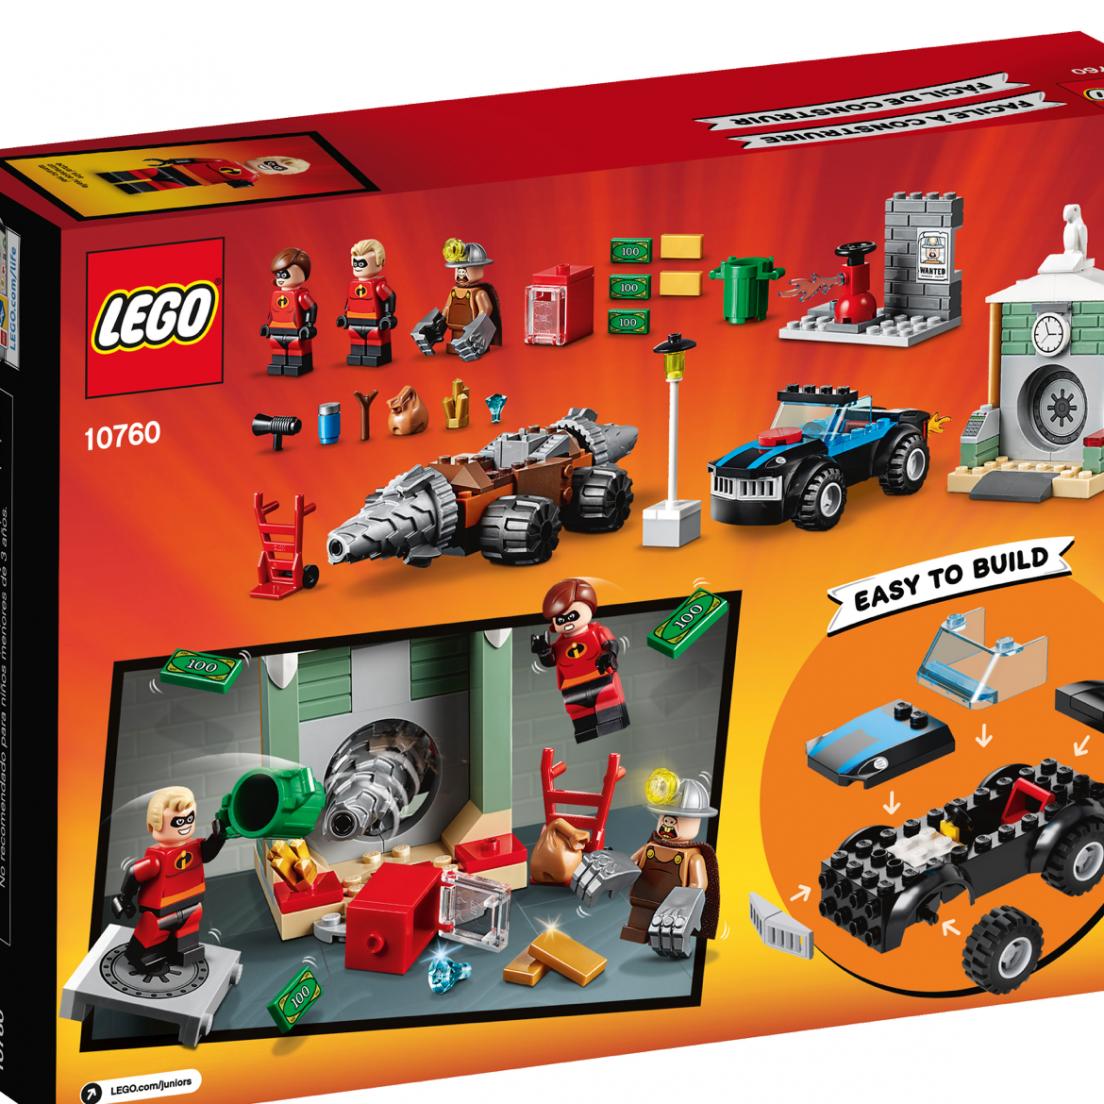 LEGO Juniors - Incredibles 2 - 10760 Underminer - Box Back.jpg